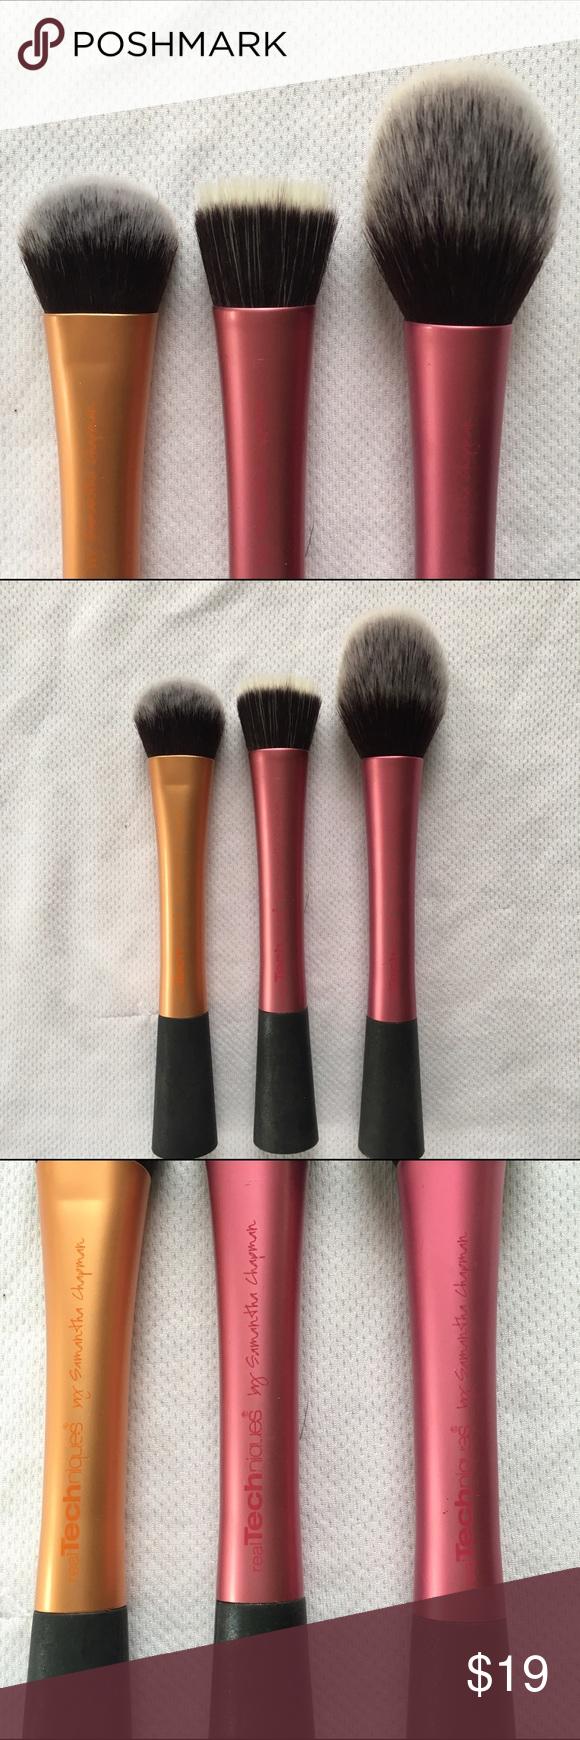 Real Techniques Brushes (4) Real techniques brushes